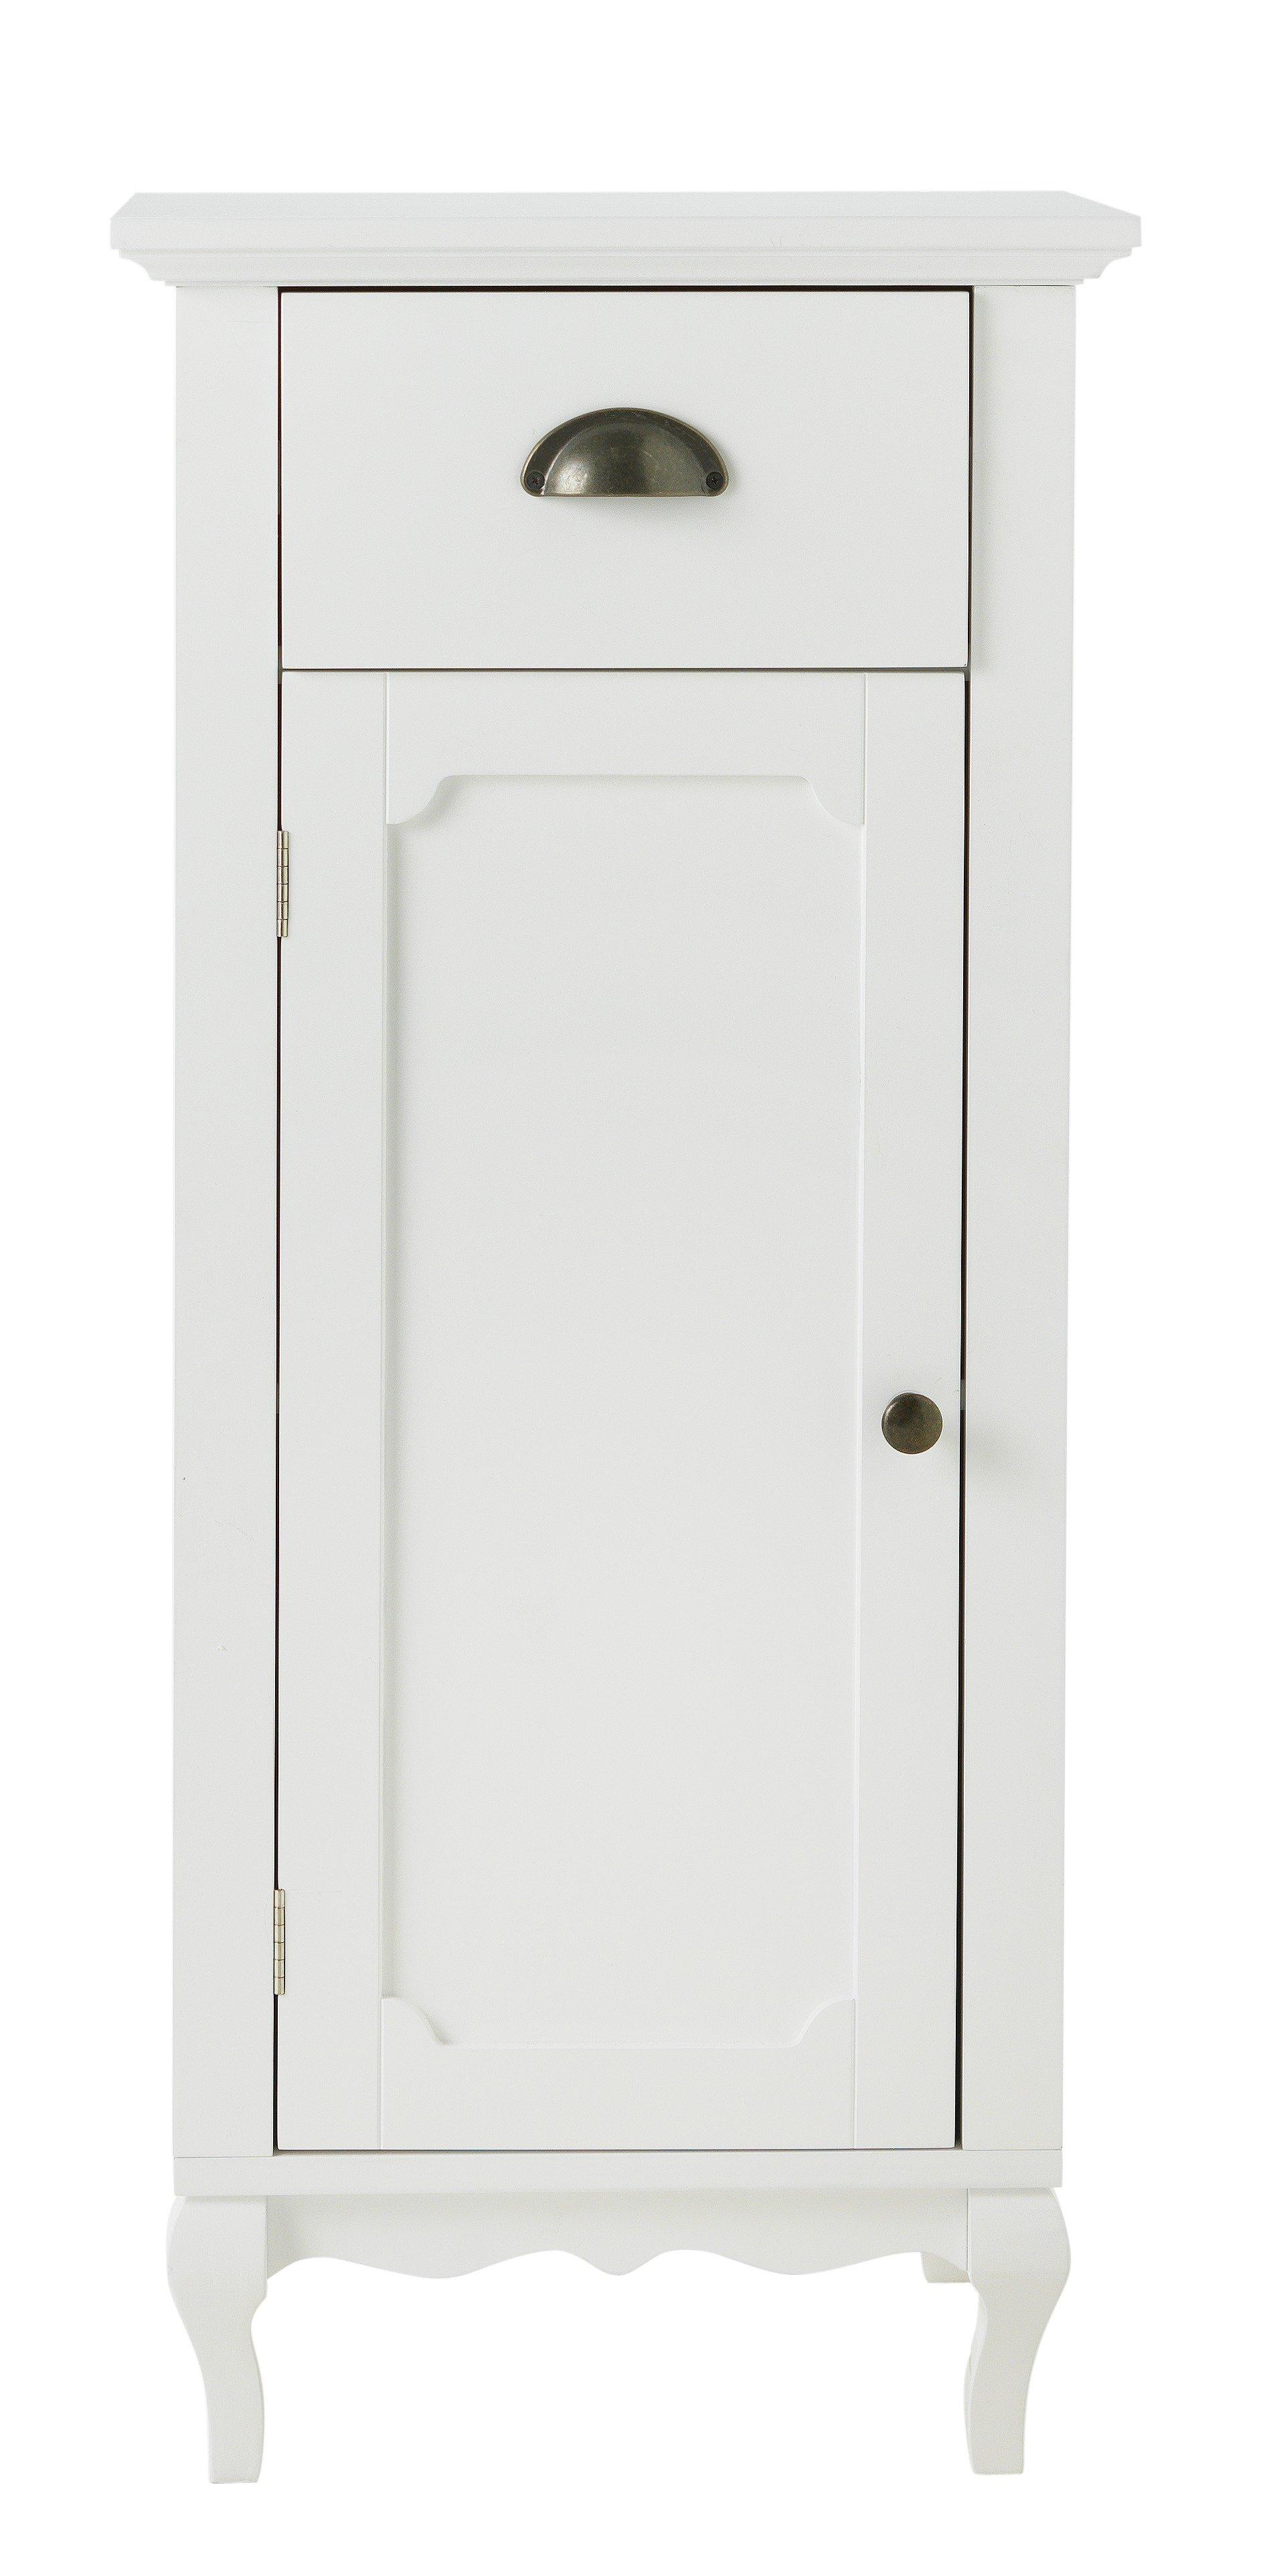 Bathroom Floor Cabinet buy collection provence bathroom floor cabinet - white at argos.co